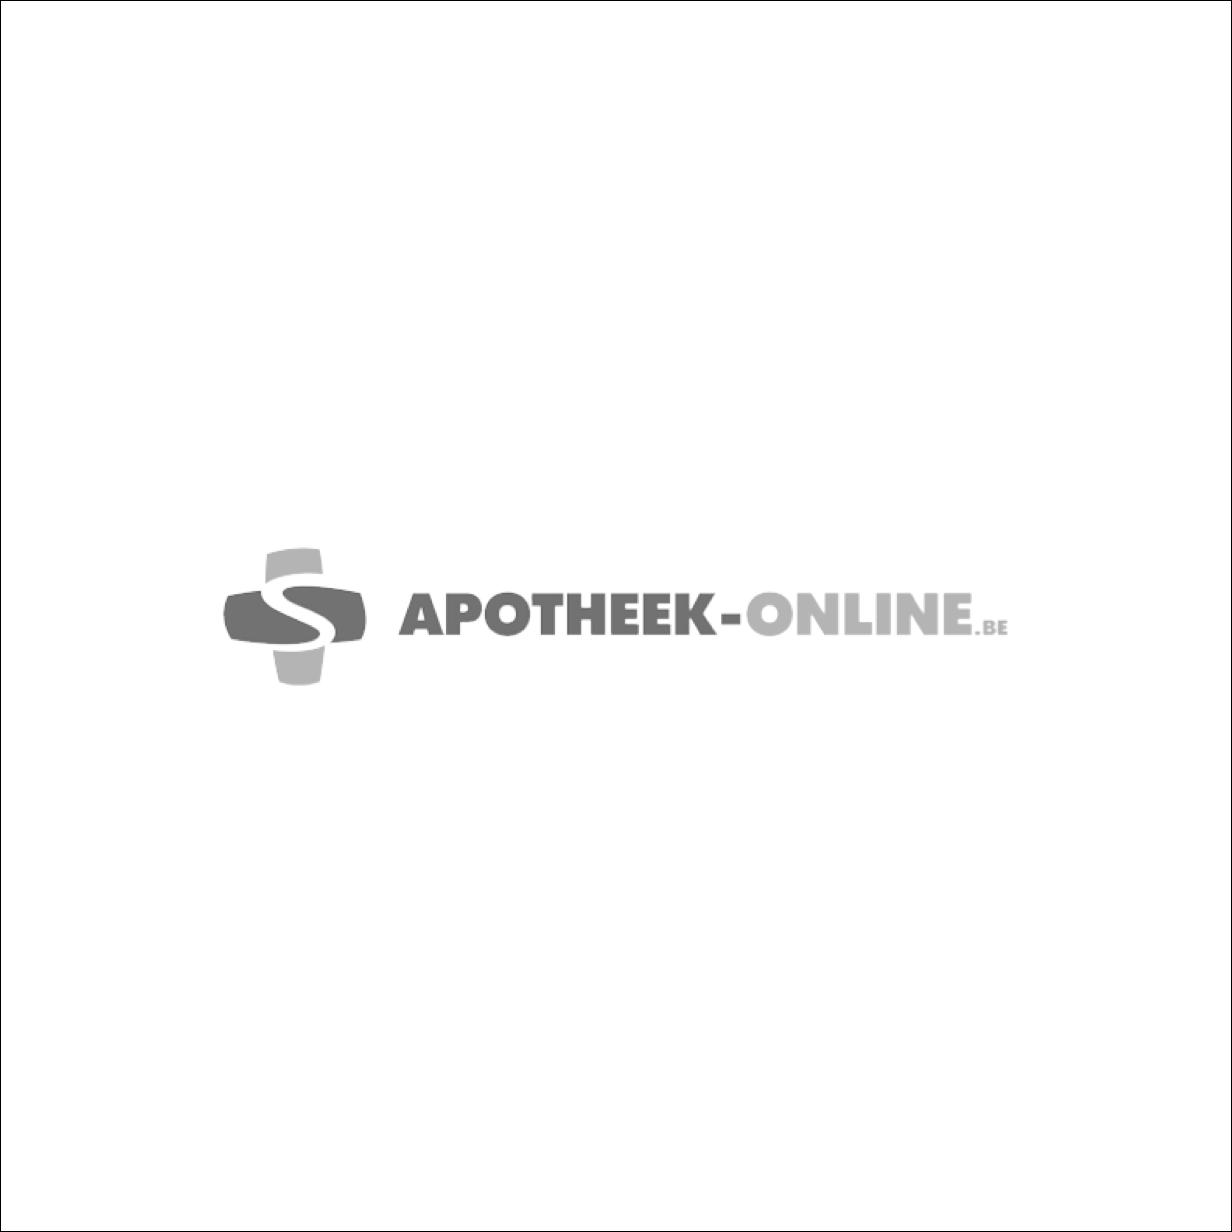 COTOPADS KATOEN 5X 5CM 500 90000